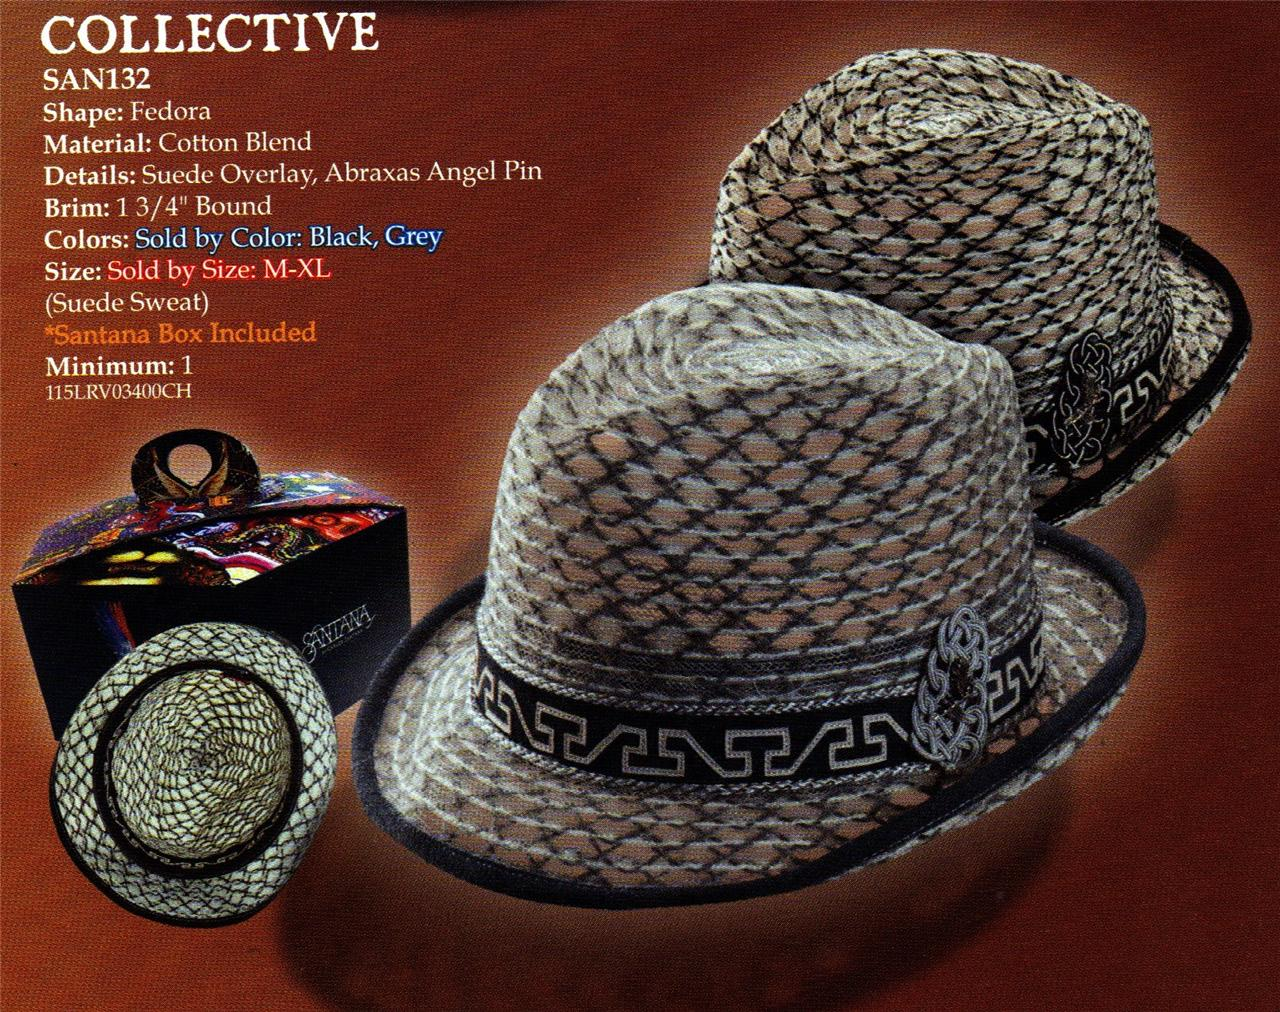 DORFMAN-PACIFIC-Greek-Roman-Collective-CARLOS-SANTANA-Cotton-FEDORA-HAT-M-L-XL